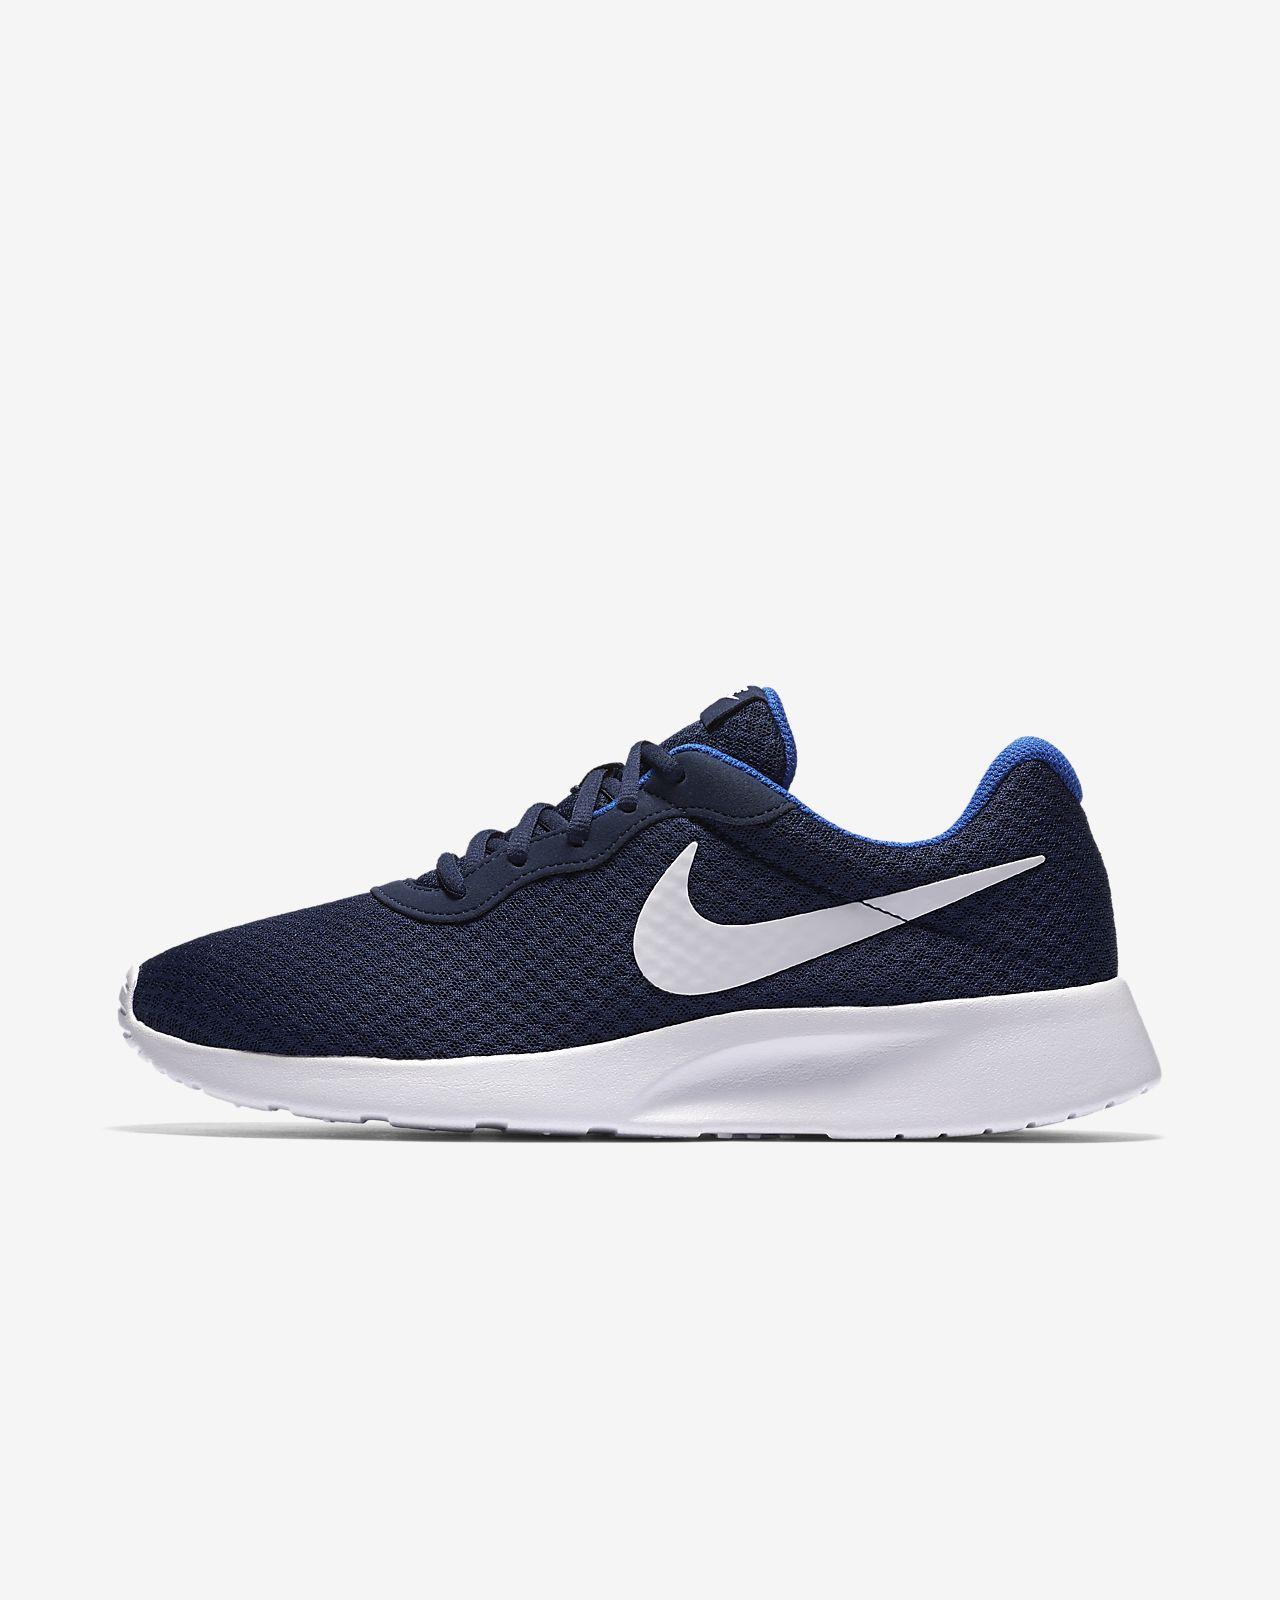 Low Resolution Pánská bota Nike Tanjun Pánská bota Nike Tanjun f25de8ebc0